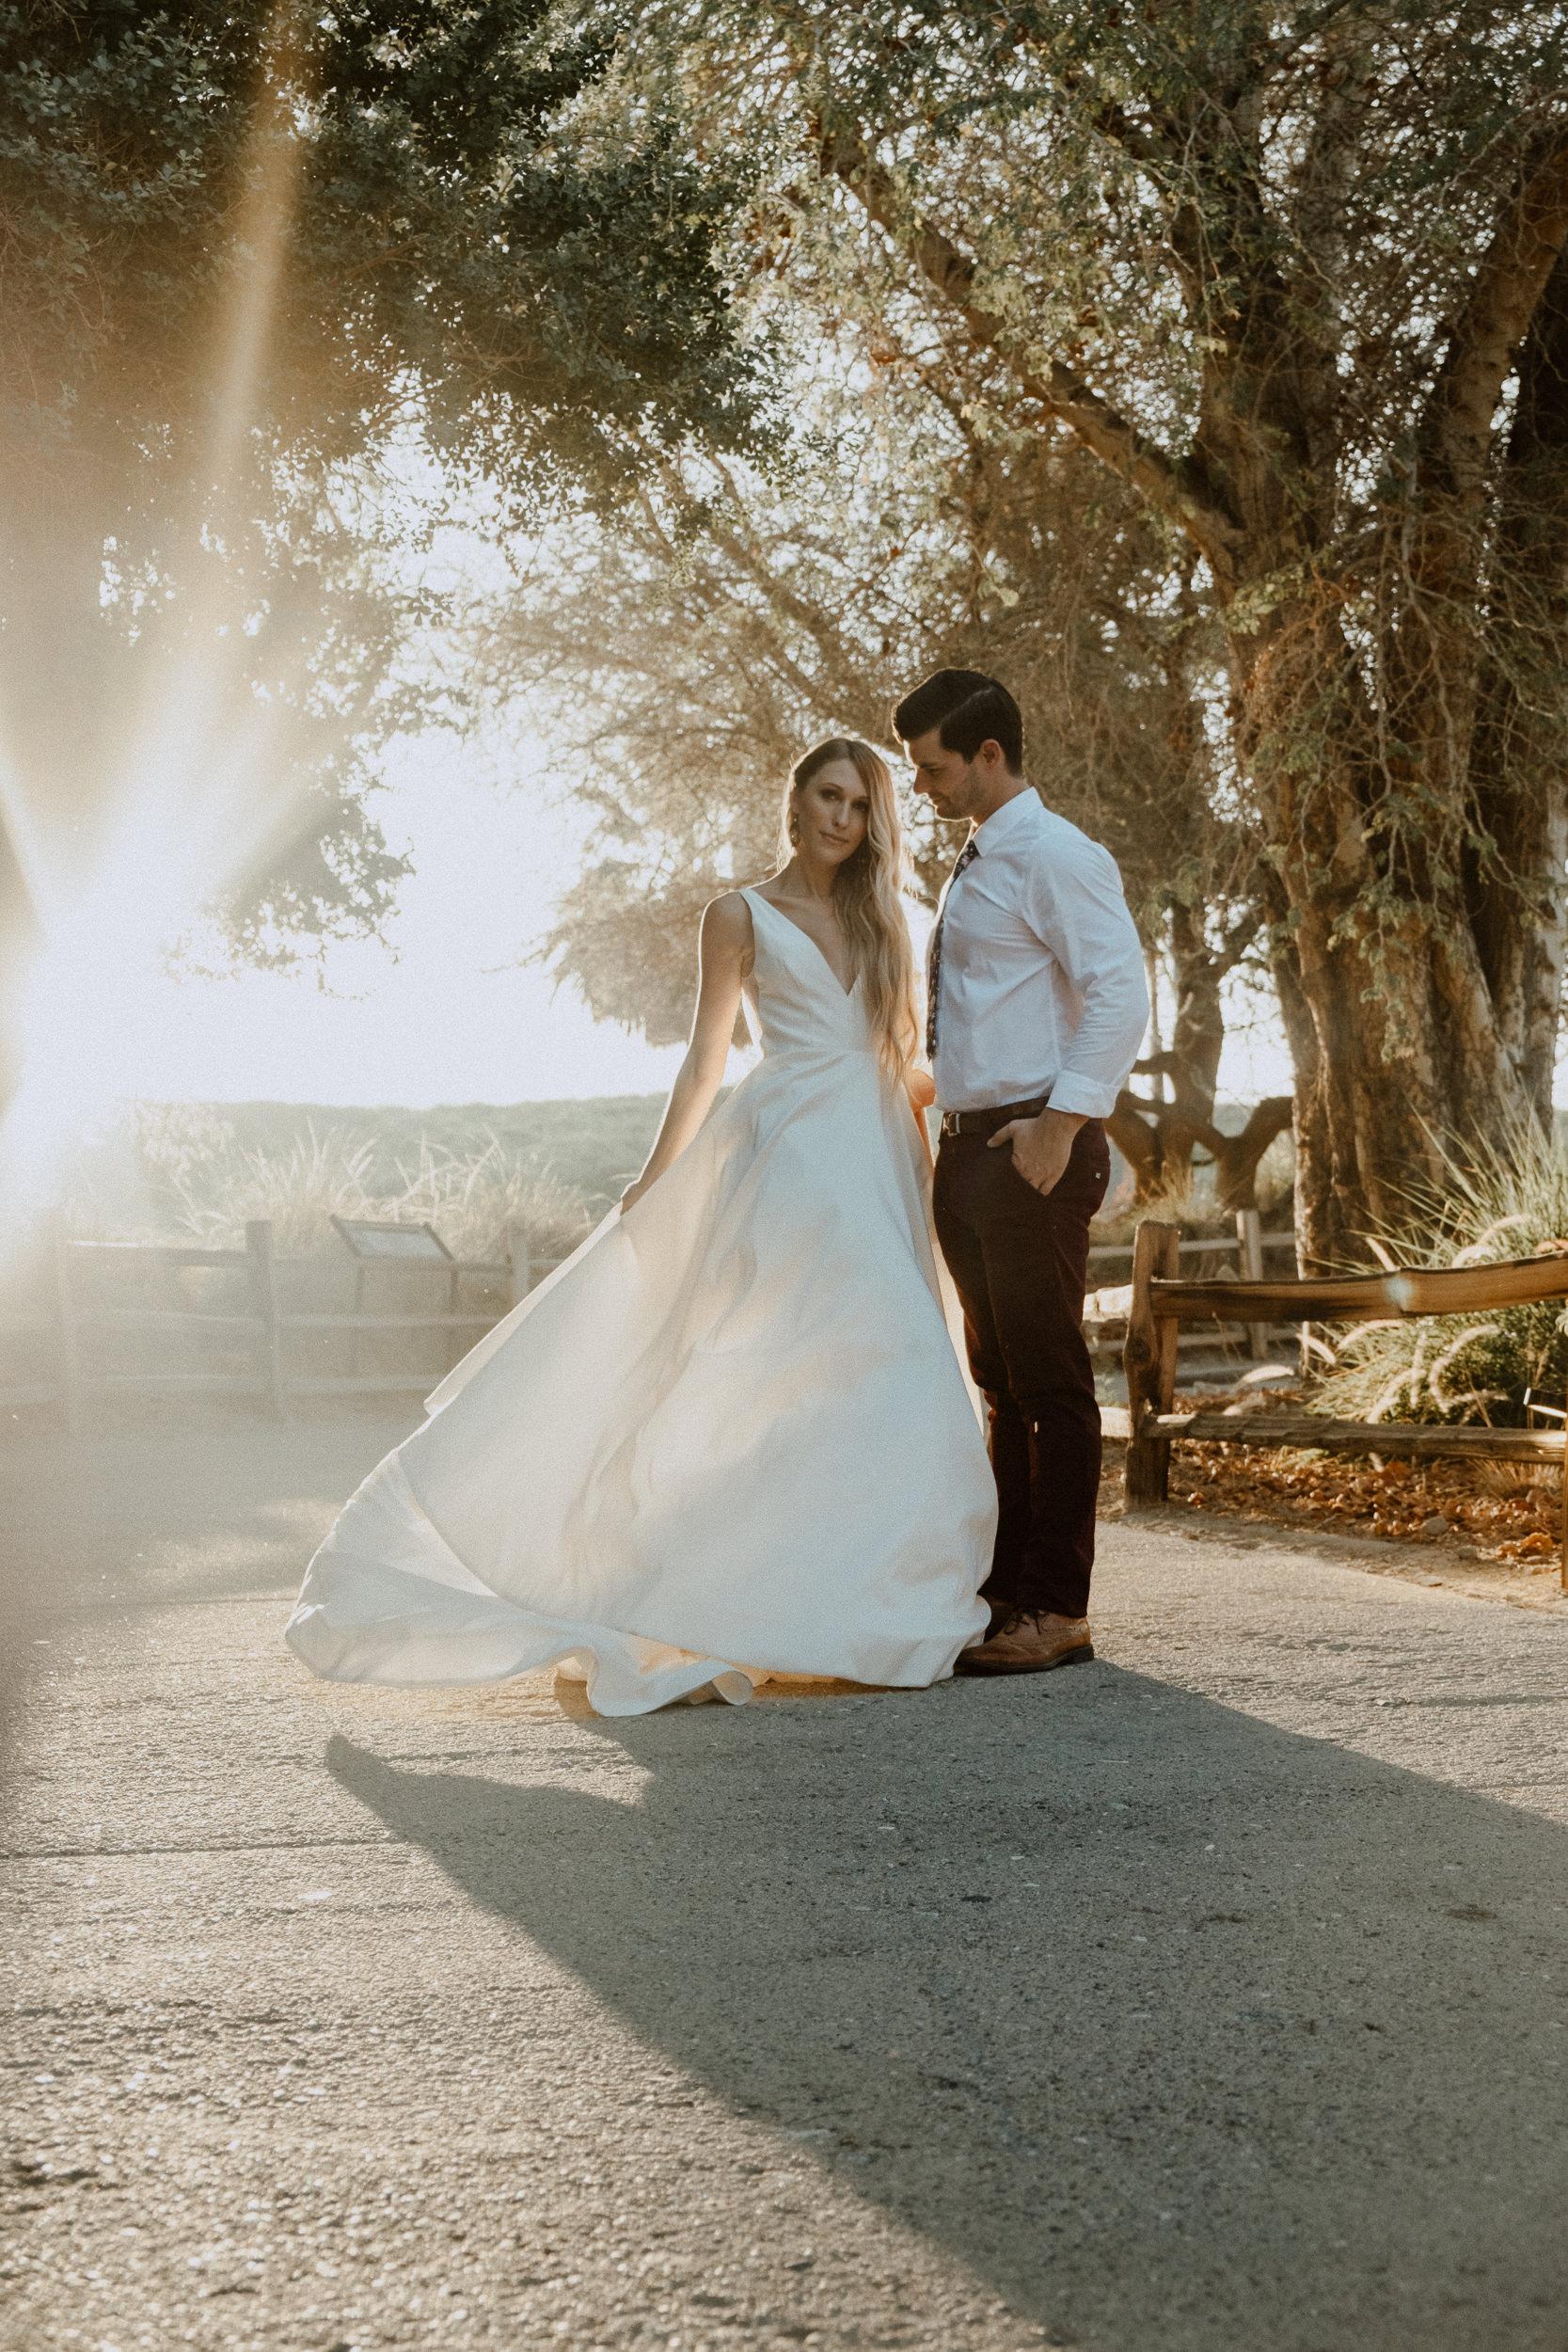 sChelsie + Chris - The Desert Shootout Wedding Romantics at The Living Desert-36.jpg